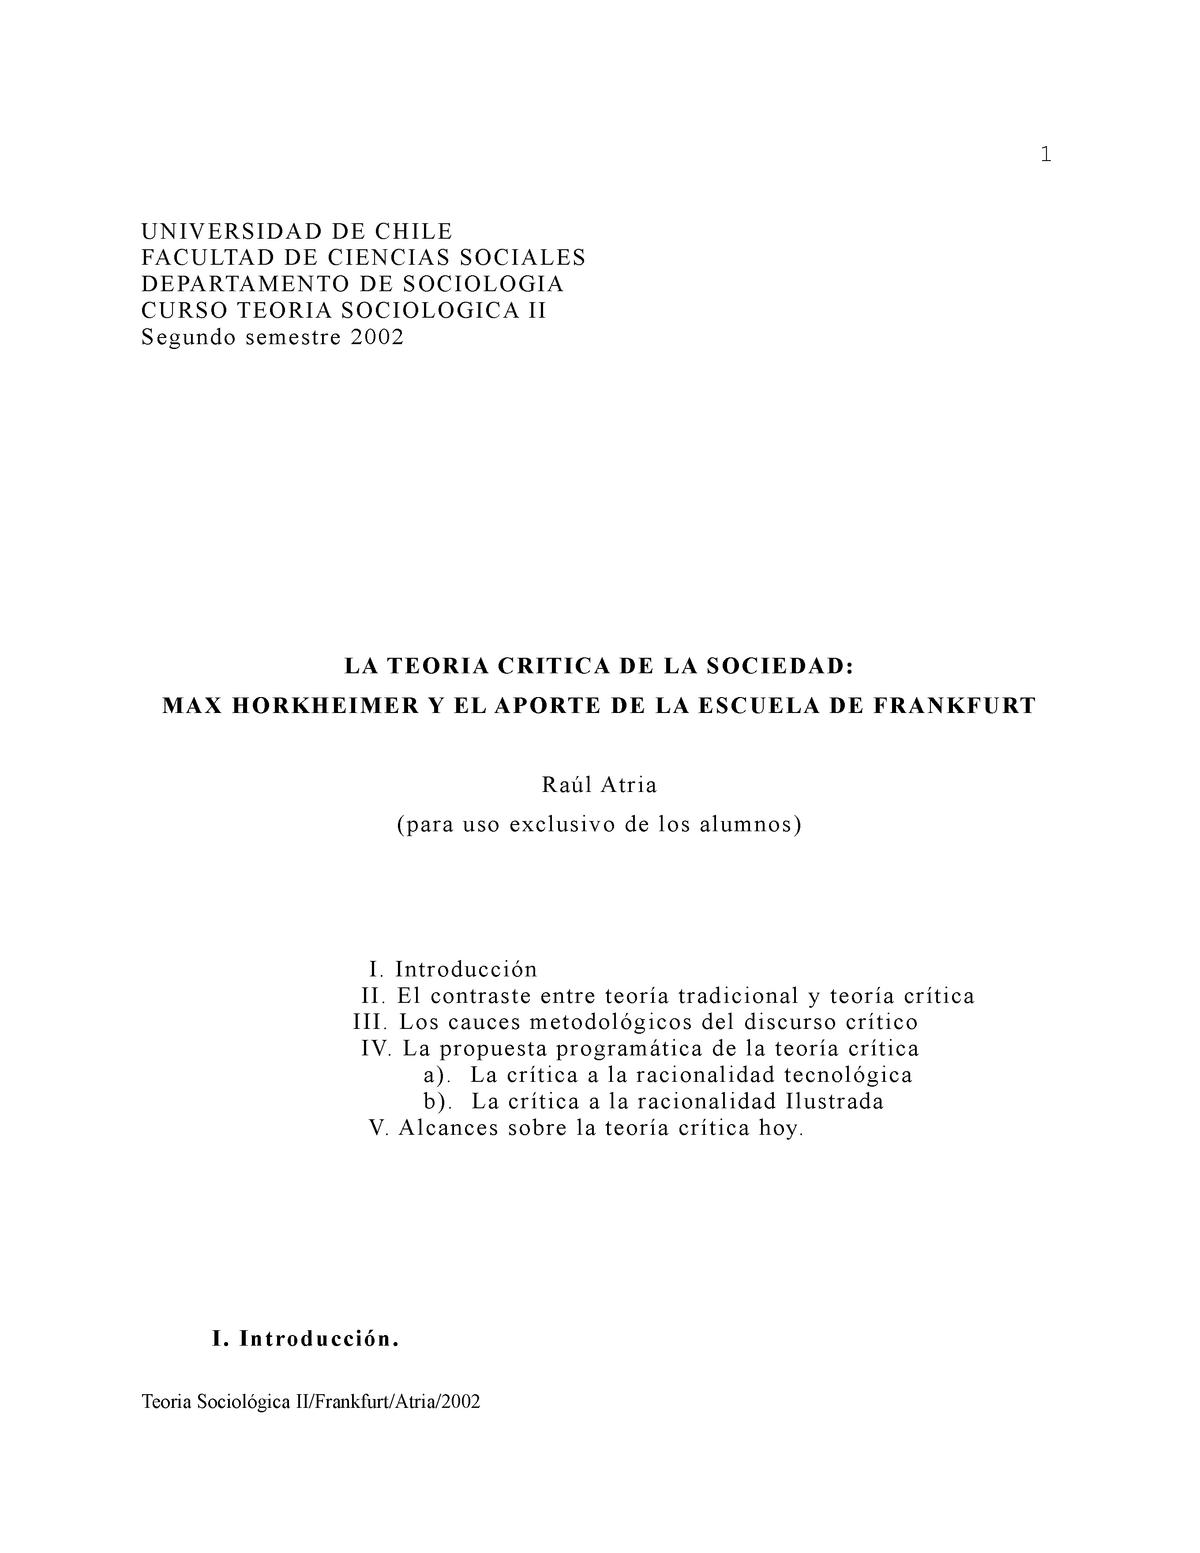 Resumen Teoría Crítica Horkheimer Escuela De Frankfurt